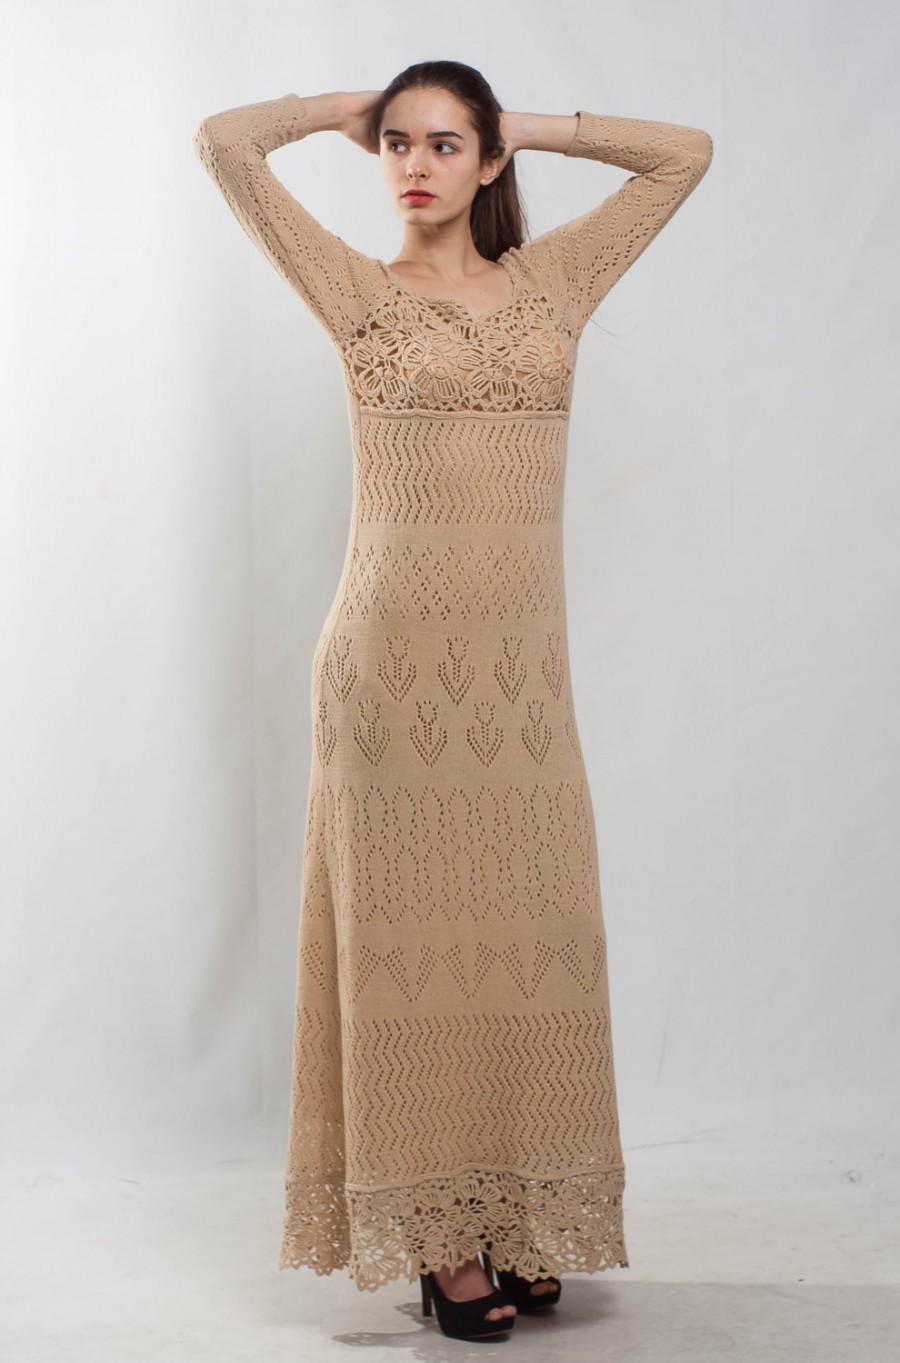 Mariage - Sheath beige crochet dress knIt off shoulder woolen Dress Prom nude Dress evening floor dress cocktail lace Dress maxi bridesmaid nude Dress